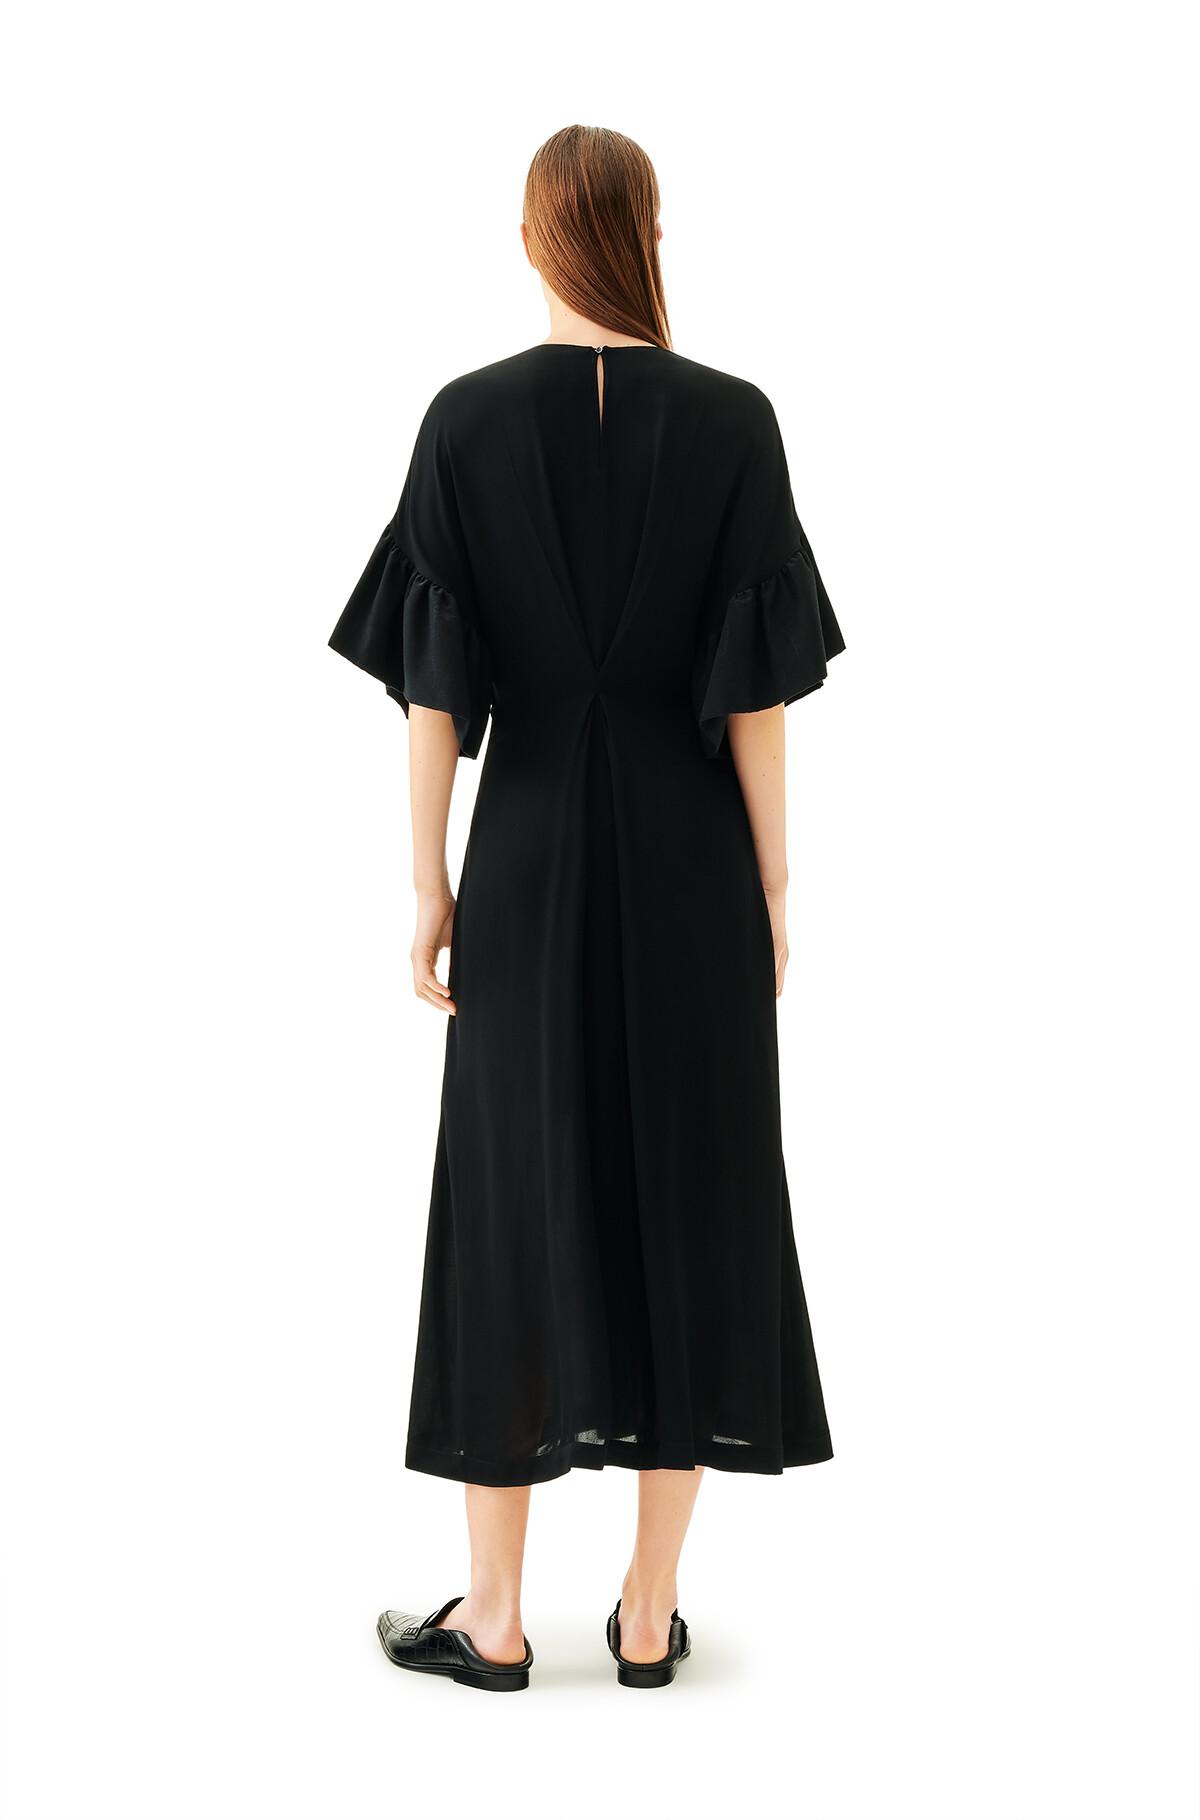 LOEWE Ruffle Sleeve Dress Black front